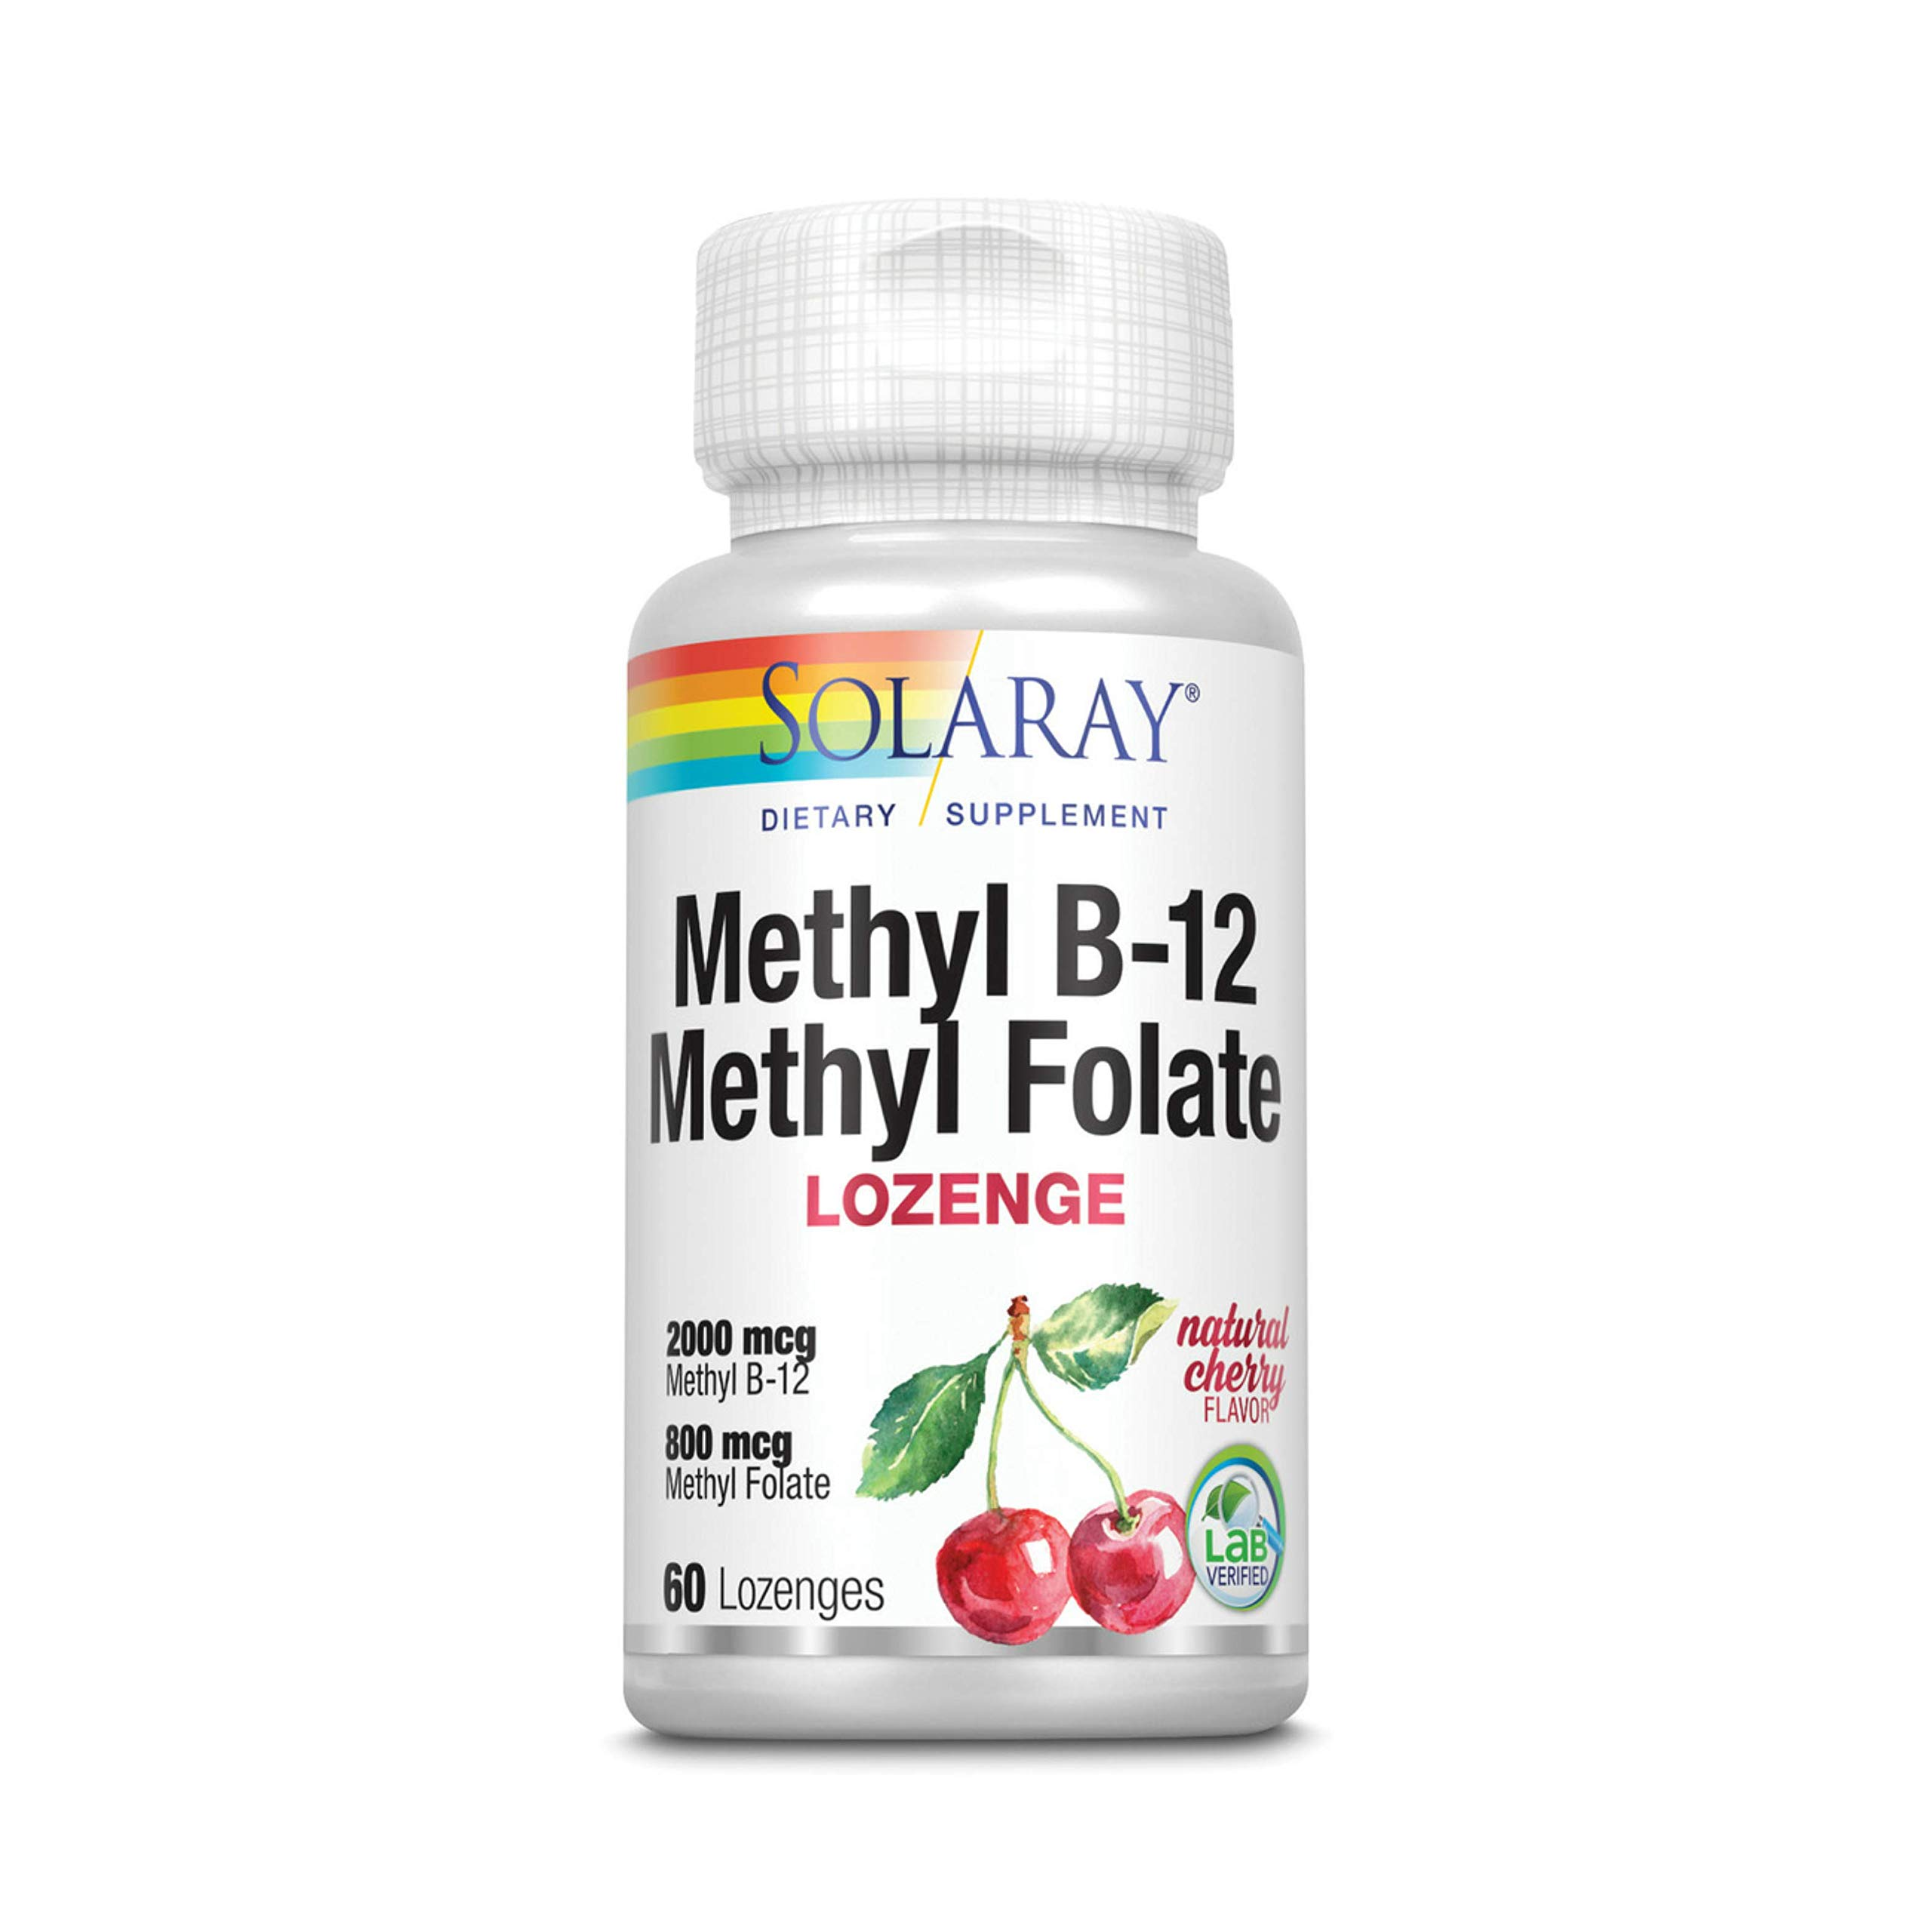 Solaray B-12 + Methyl Folate Lozenges   60 Count